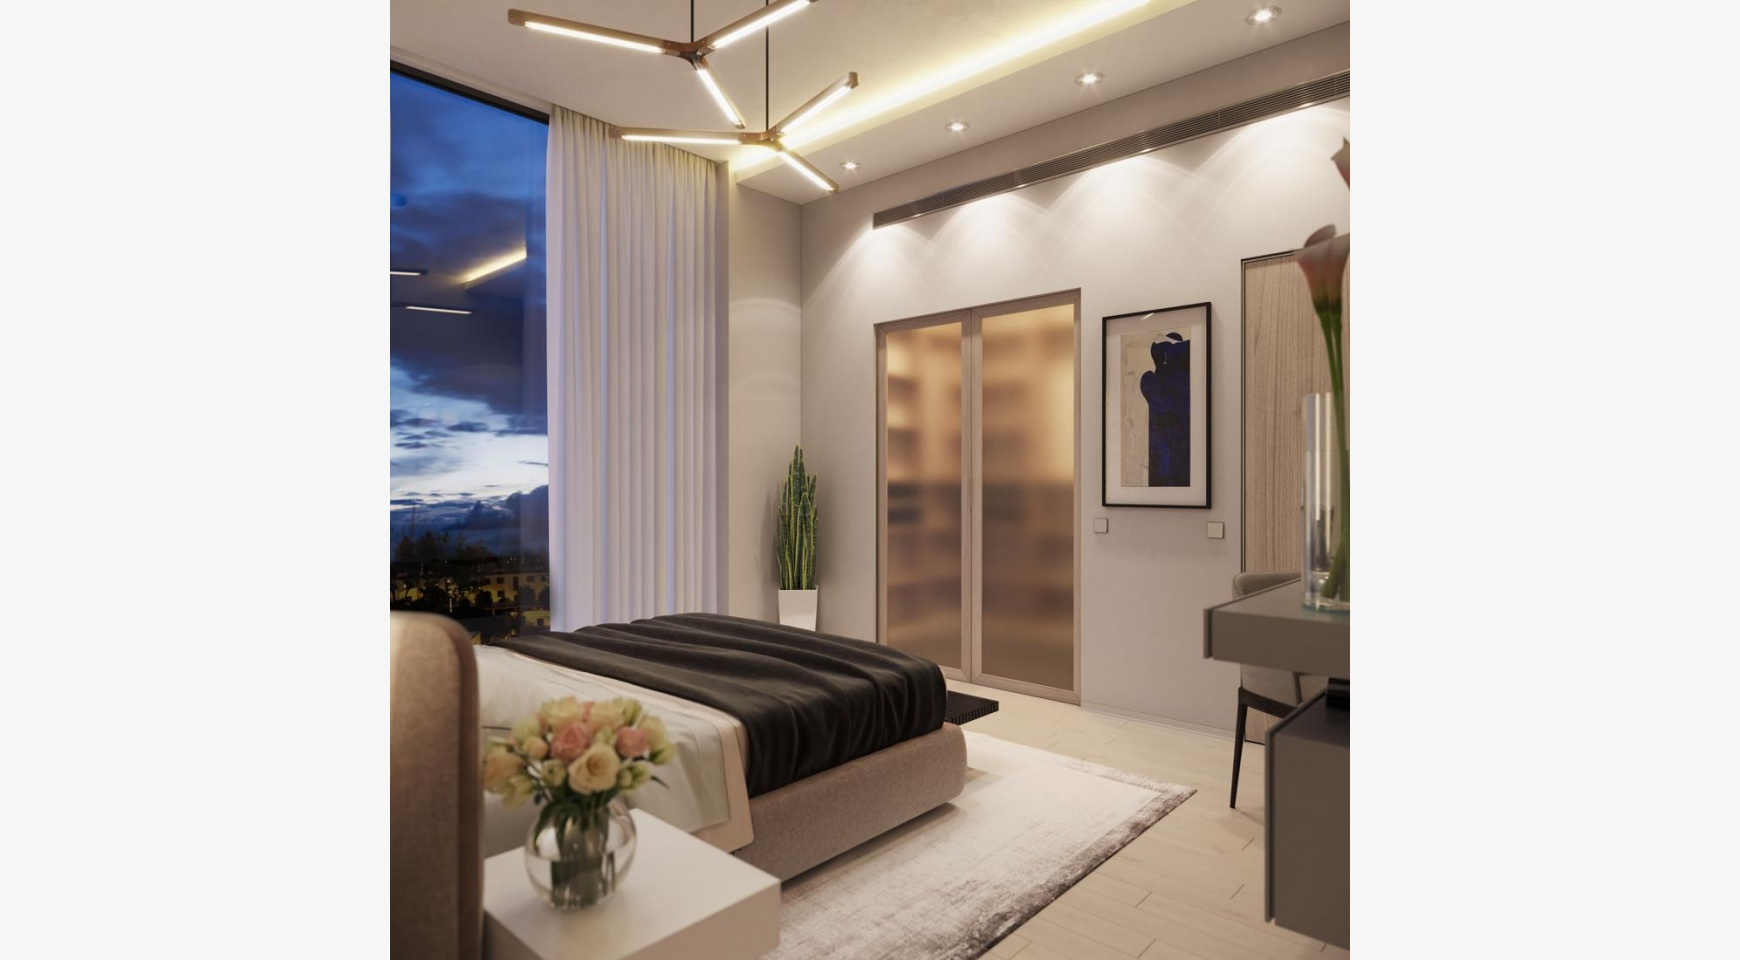 Contemporary 2 Bedroom Apartment in a New Complex near the Sea - 4